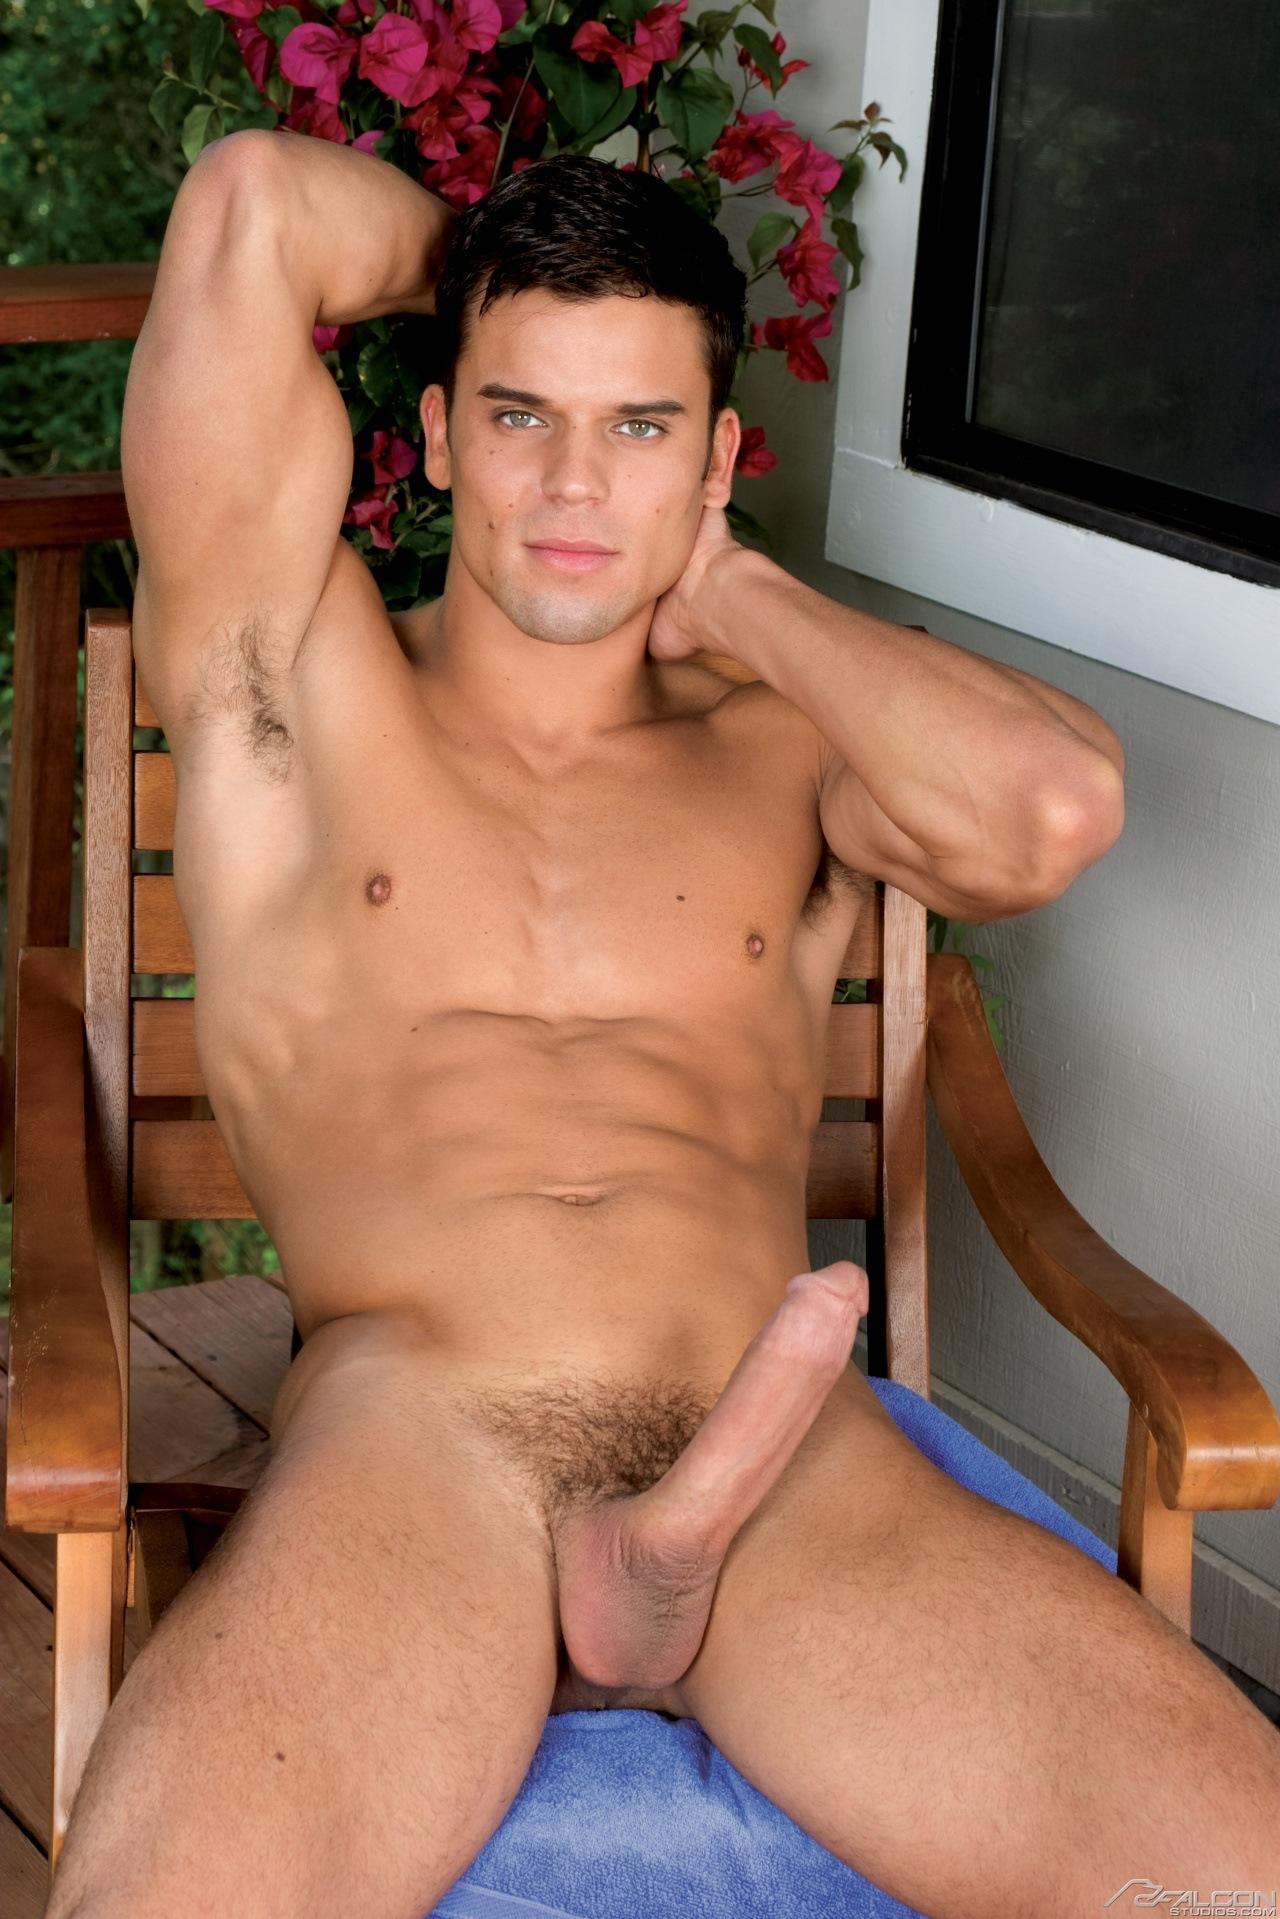 Andrew Jakk Gay Porn Star Nude Images